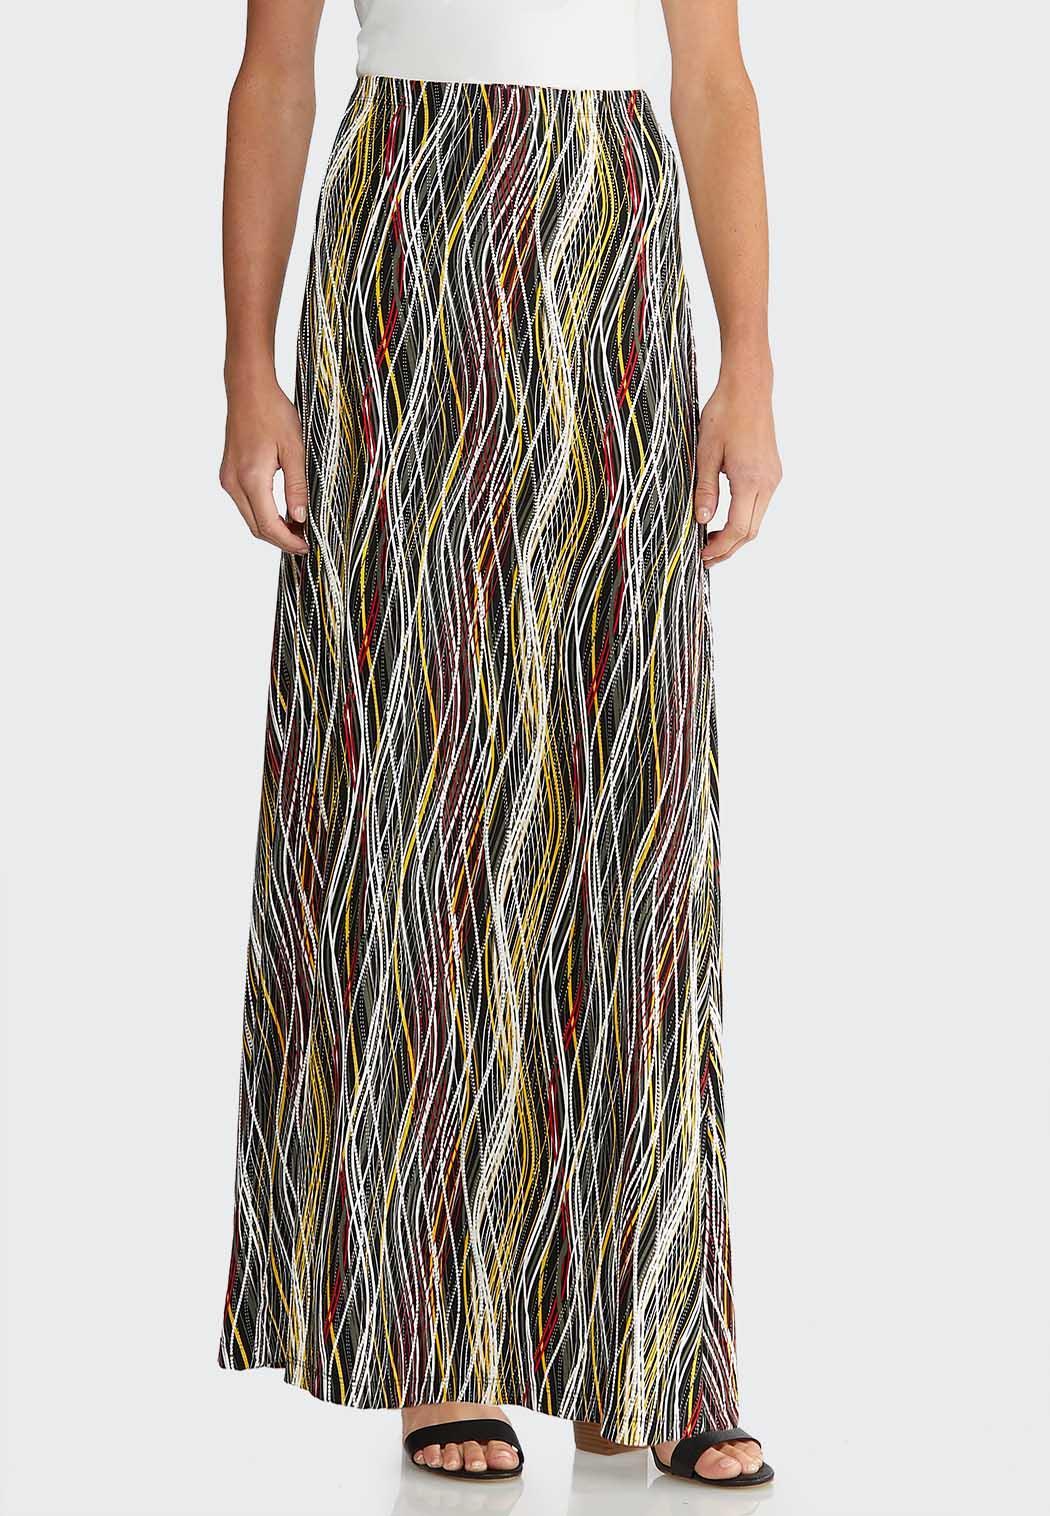 ed4f2200e7f6 Women's Plus Size Skirts